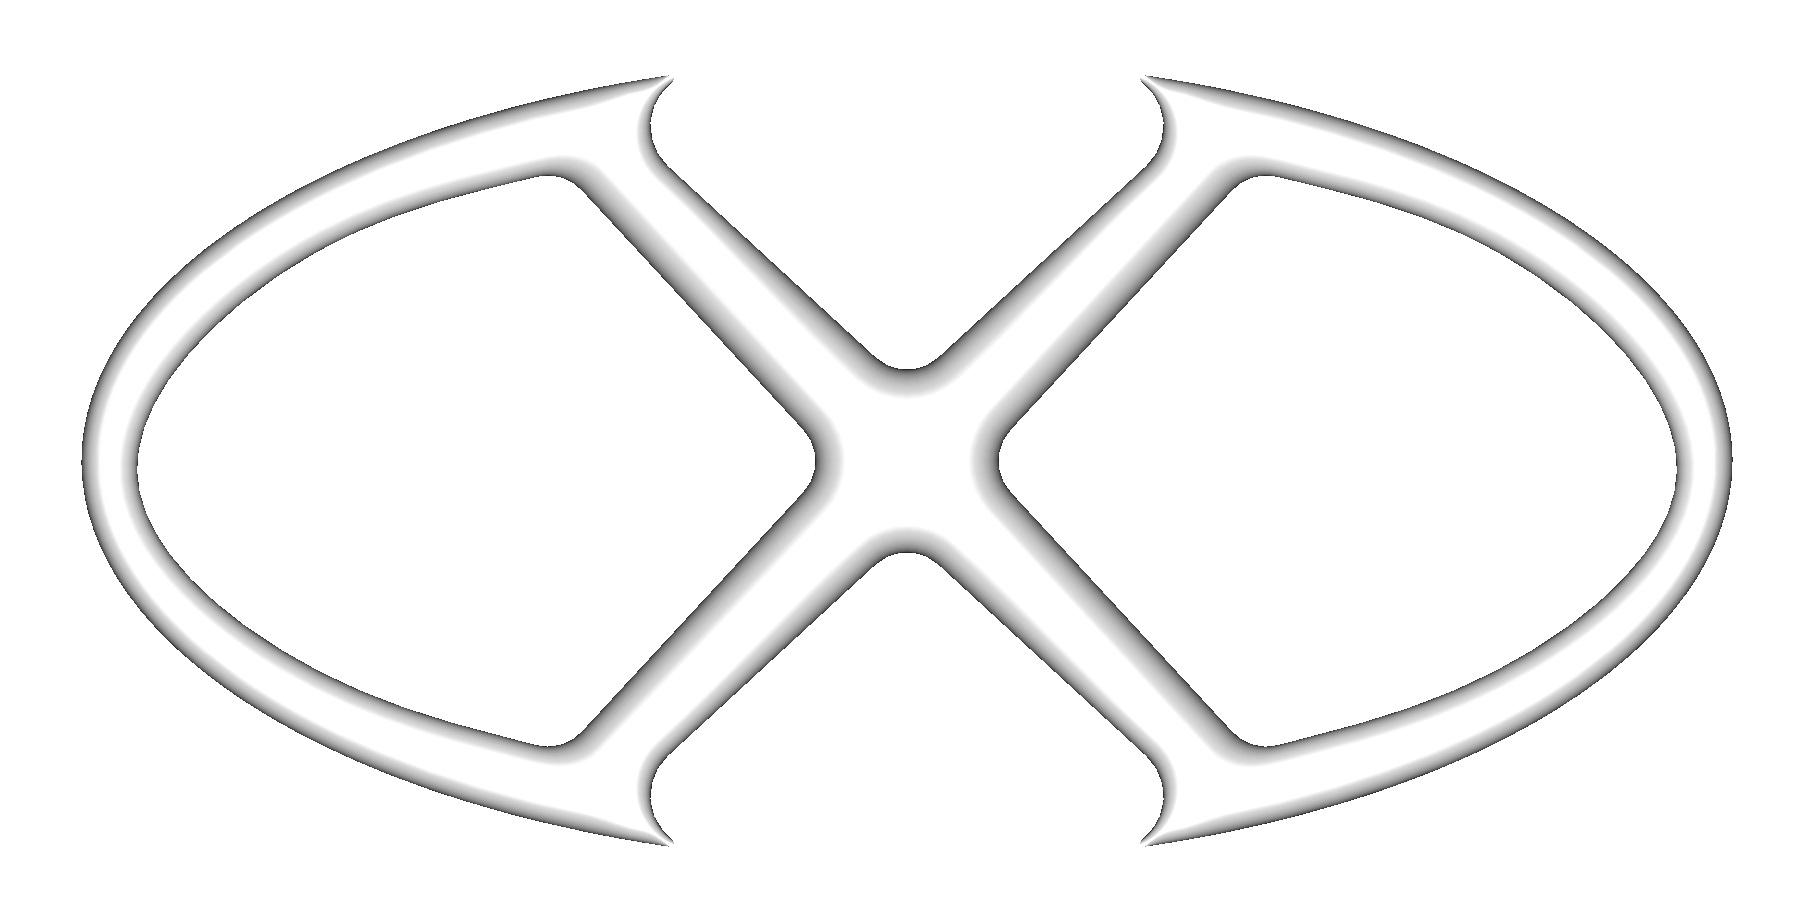 KA24E intake manifold